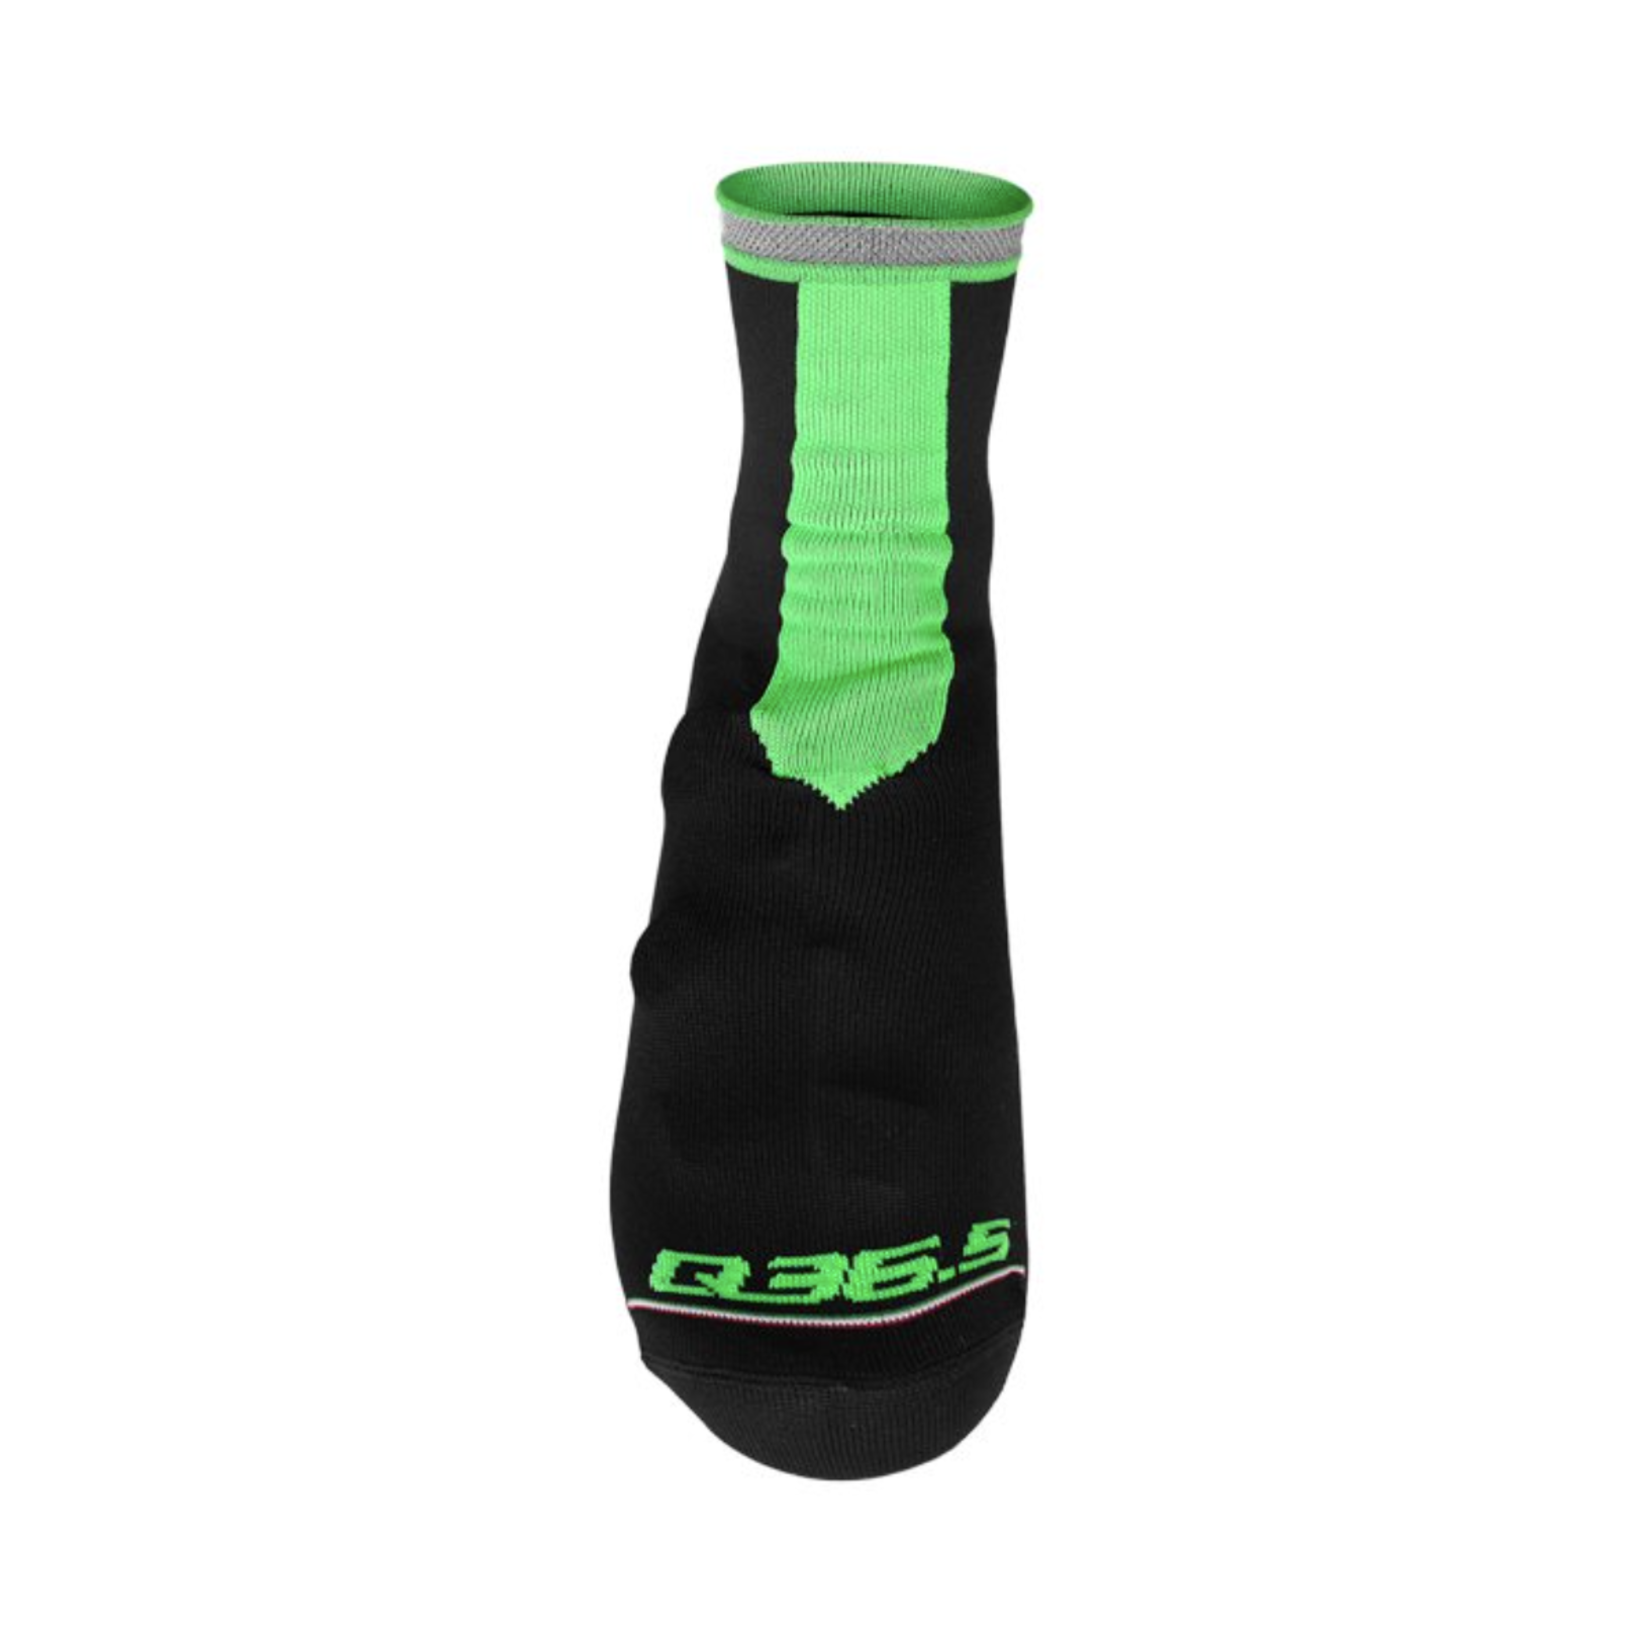 Q36.5 Q36.5 Overshoes Copriscarpa - Black